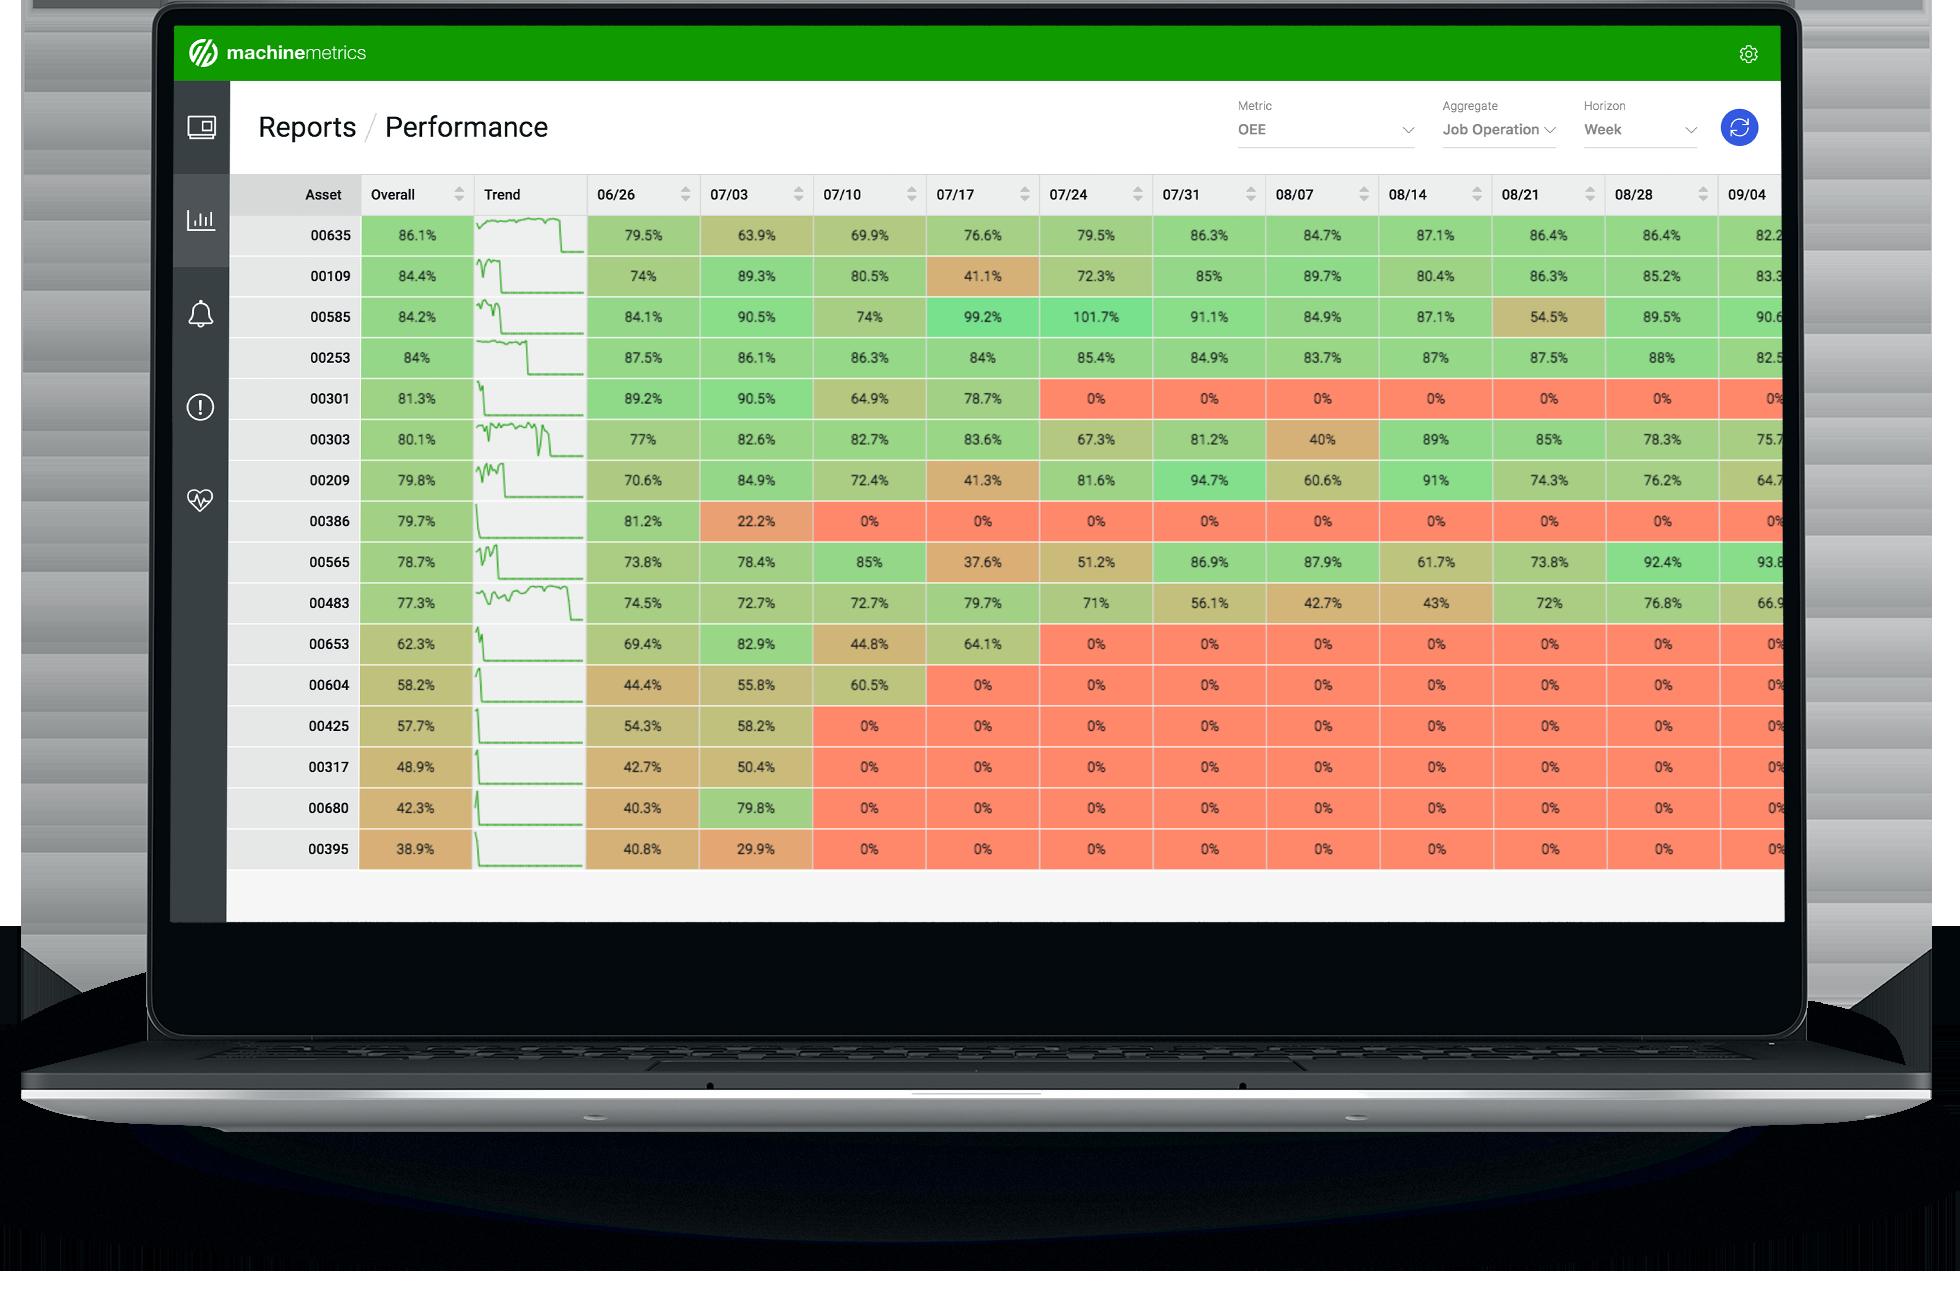 05_comp_OEE-Performance_laptop